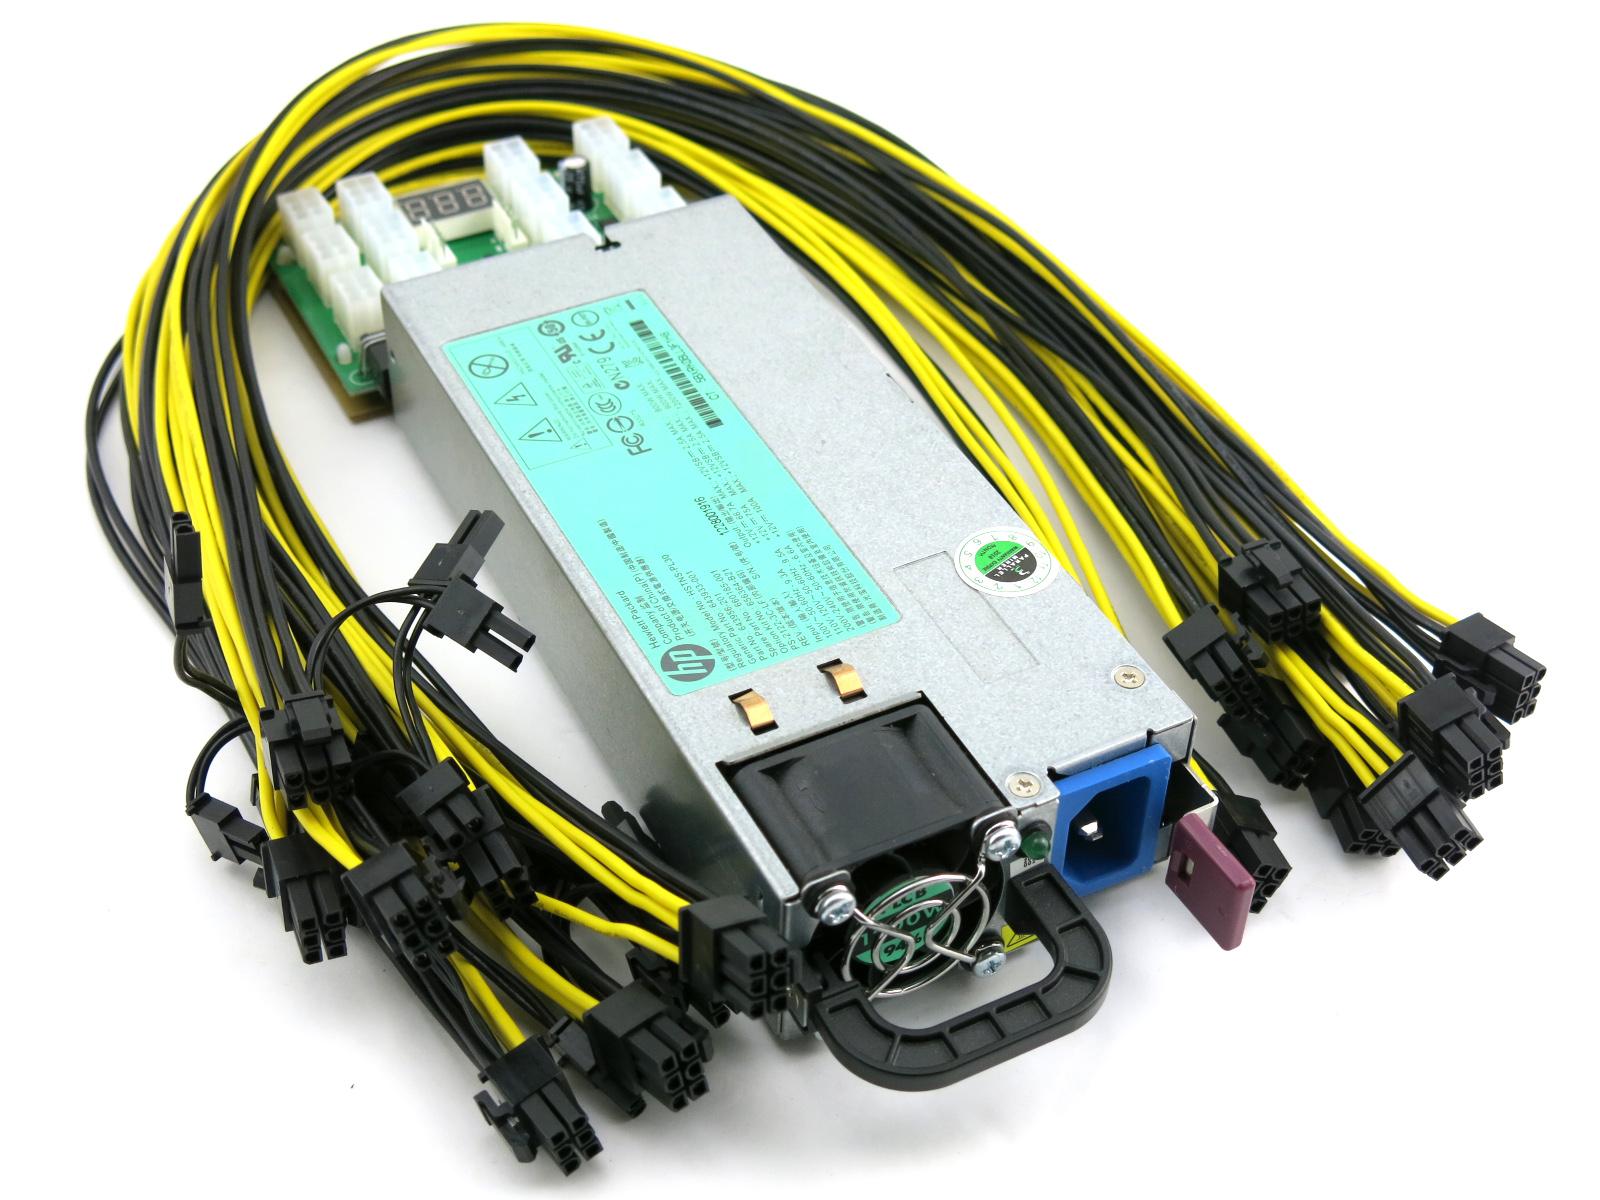 REV2 All 6pin+2 Cable - GPU Mining Power Supply Kit: HP 1200 watt Platinum  94% ETH,DASH,XMR,ZEC,GPU